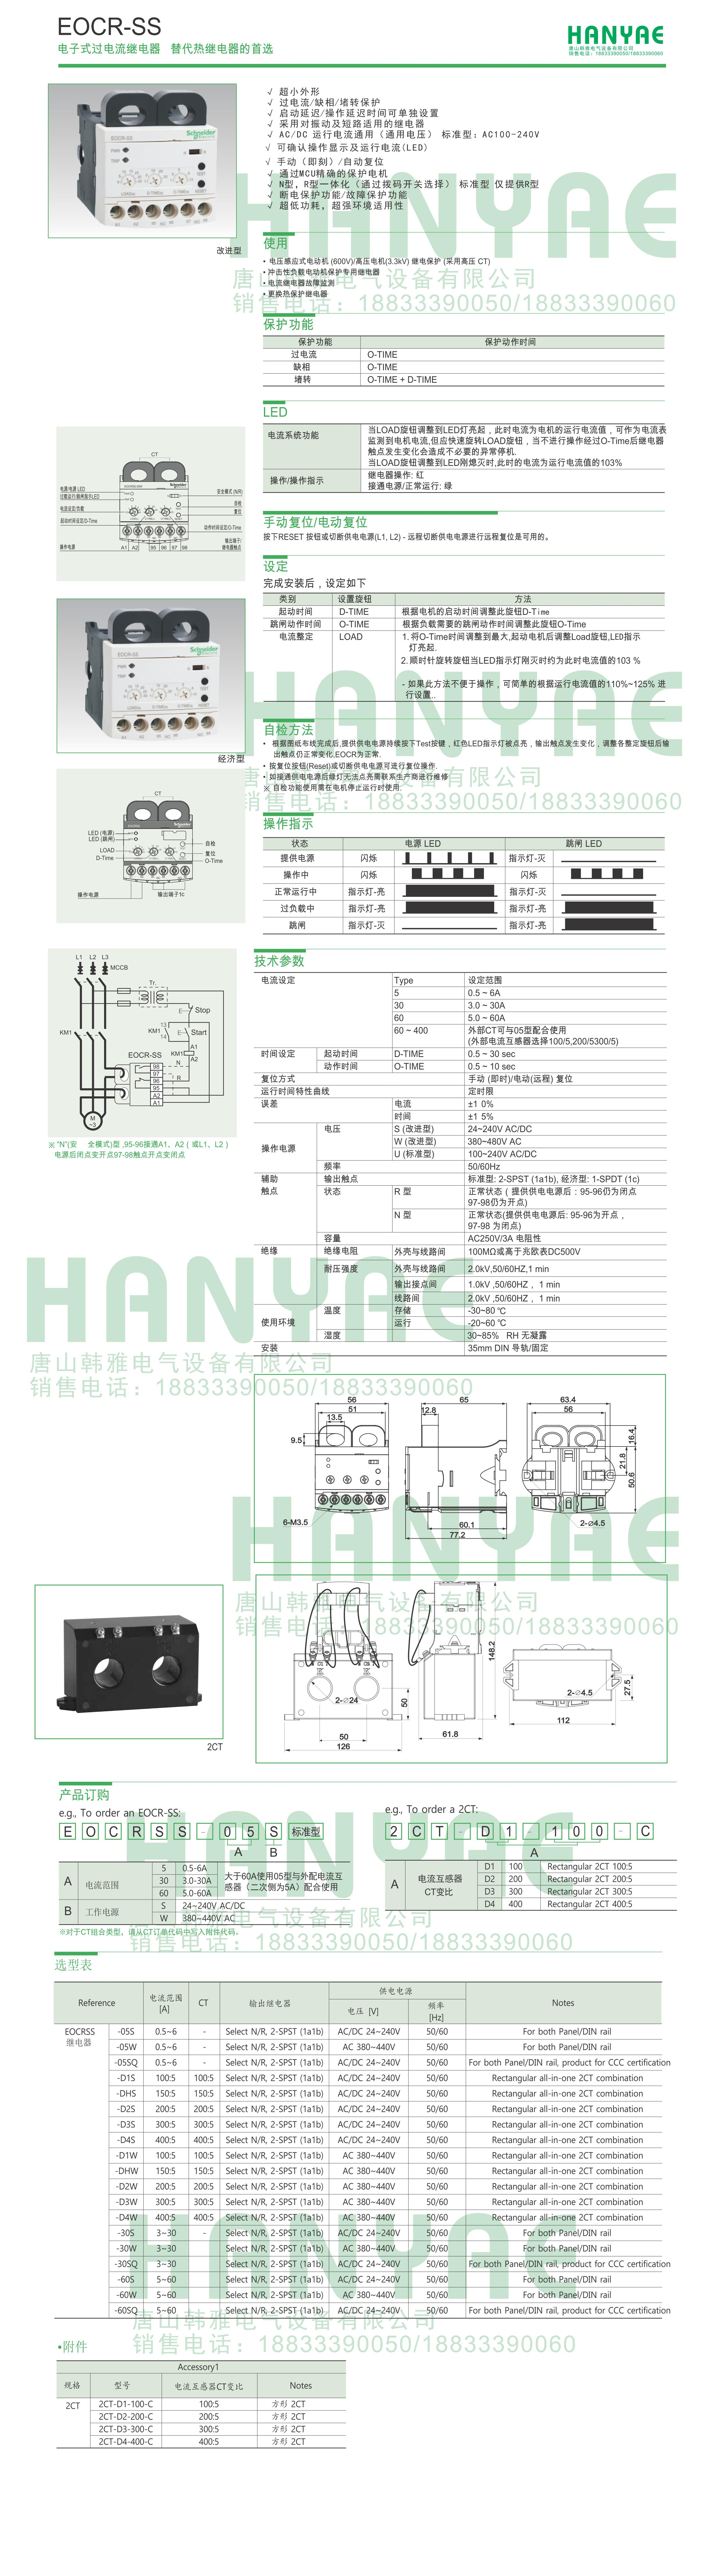 EOCRSS-60RY7缺相保护继电器 施耐德,韩国三和,韩国SAMWHA,电子式继电器,EOCR-SS